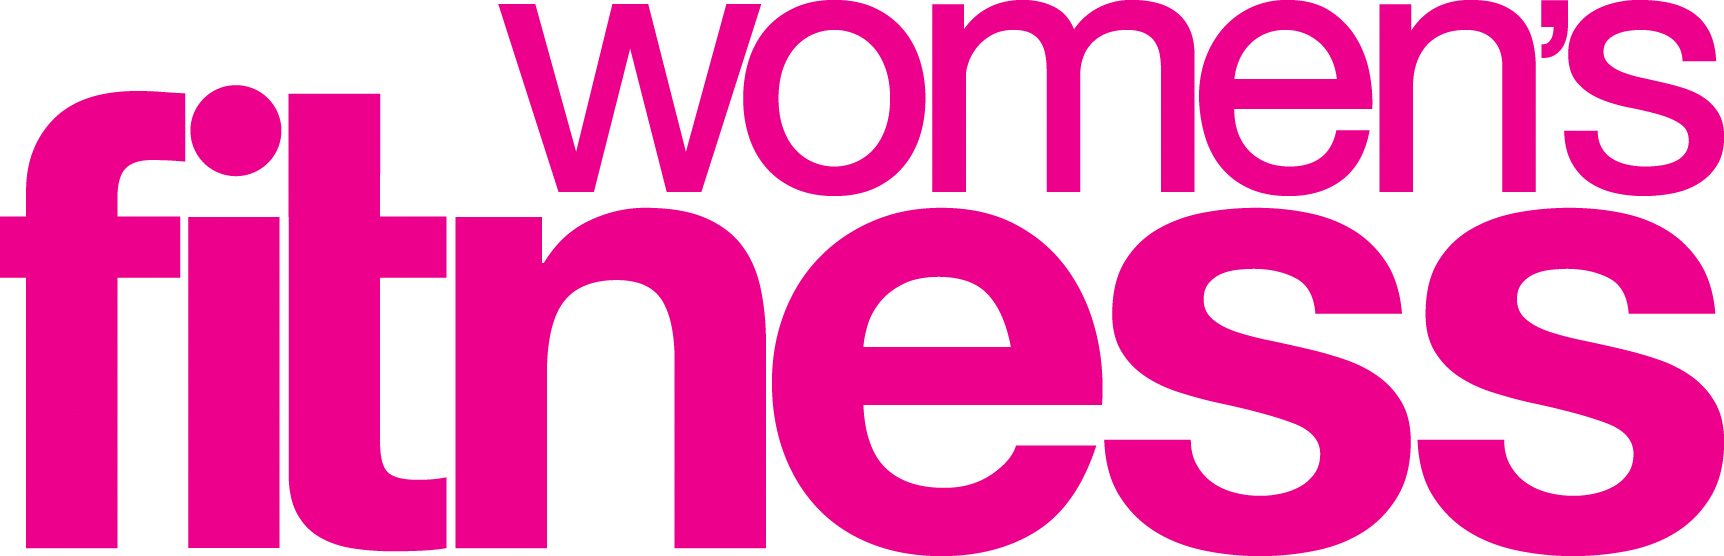 Womens-Fitness-Logo-Pink